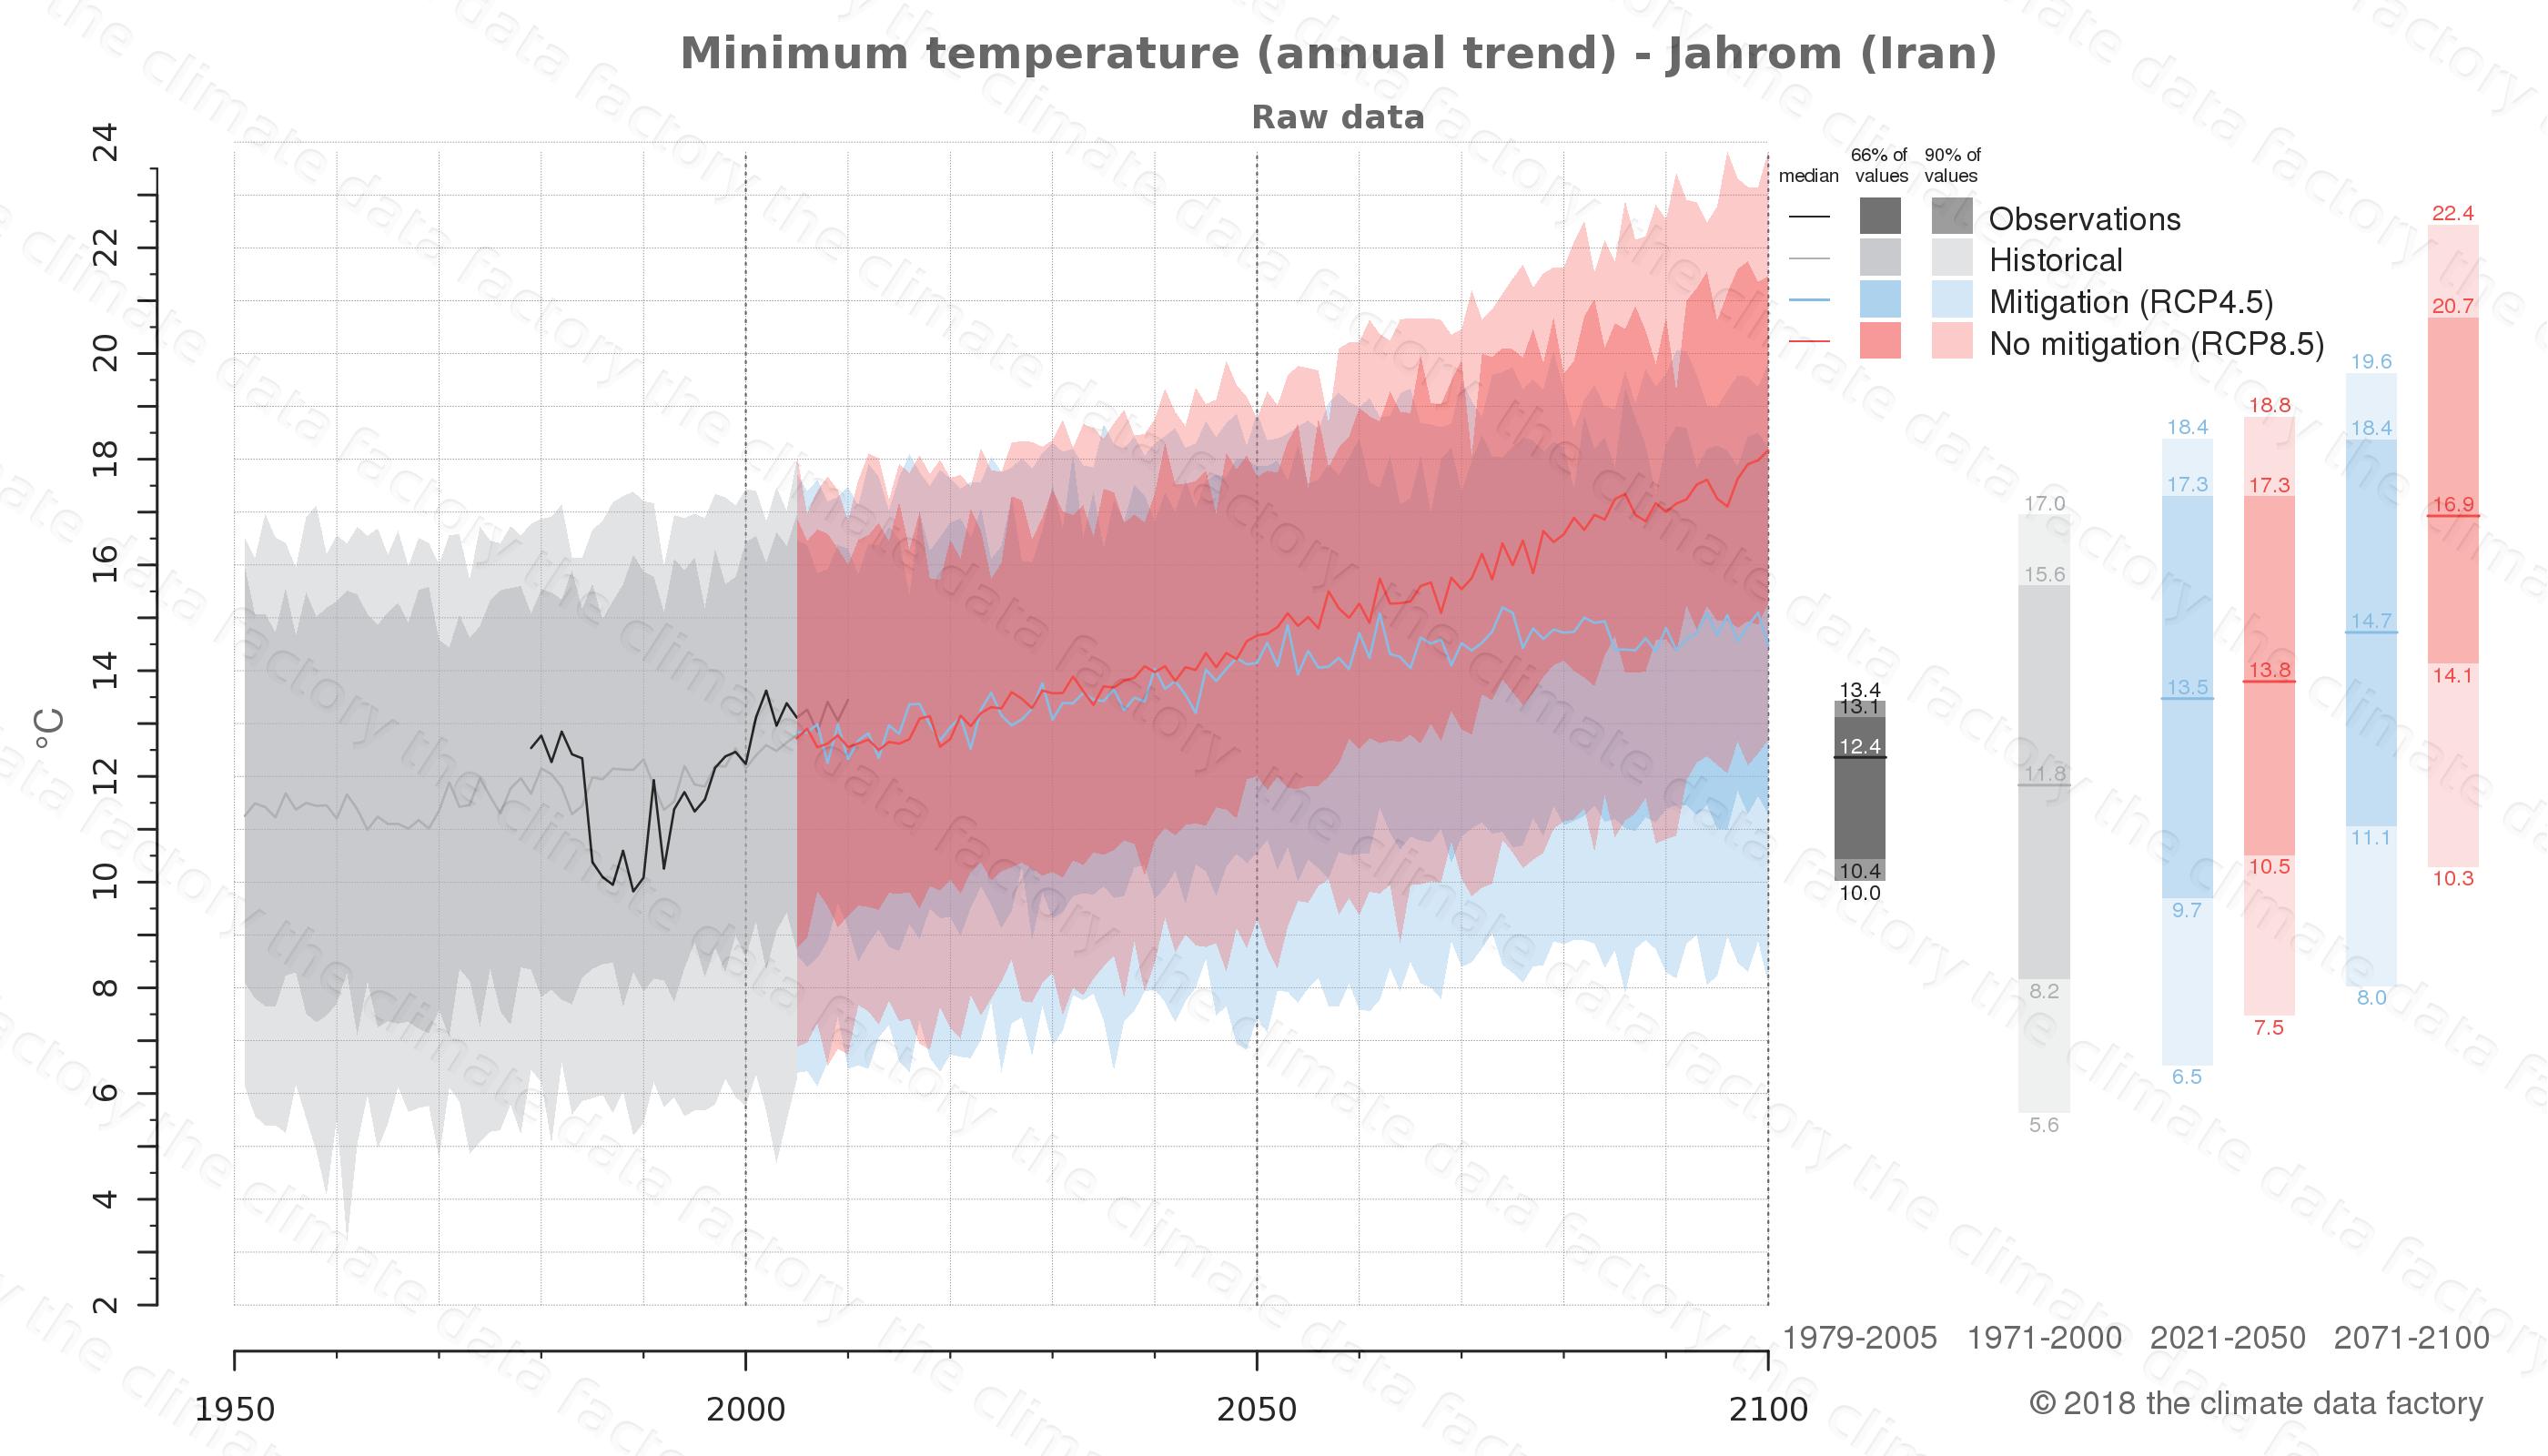 climate change data policy adaptation climate graph city data minimum-temperature jahrom iran